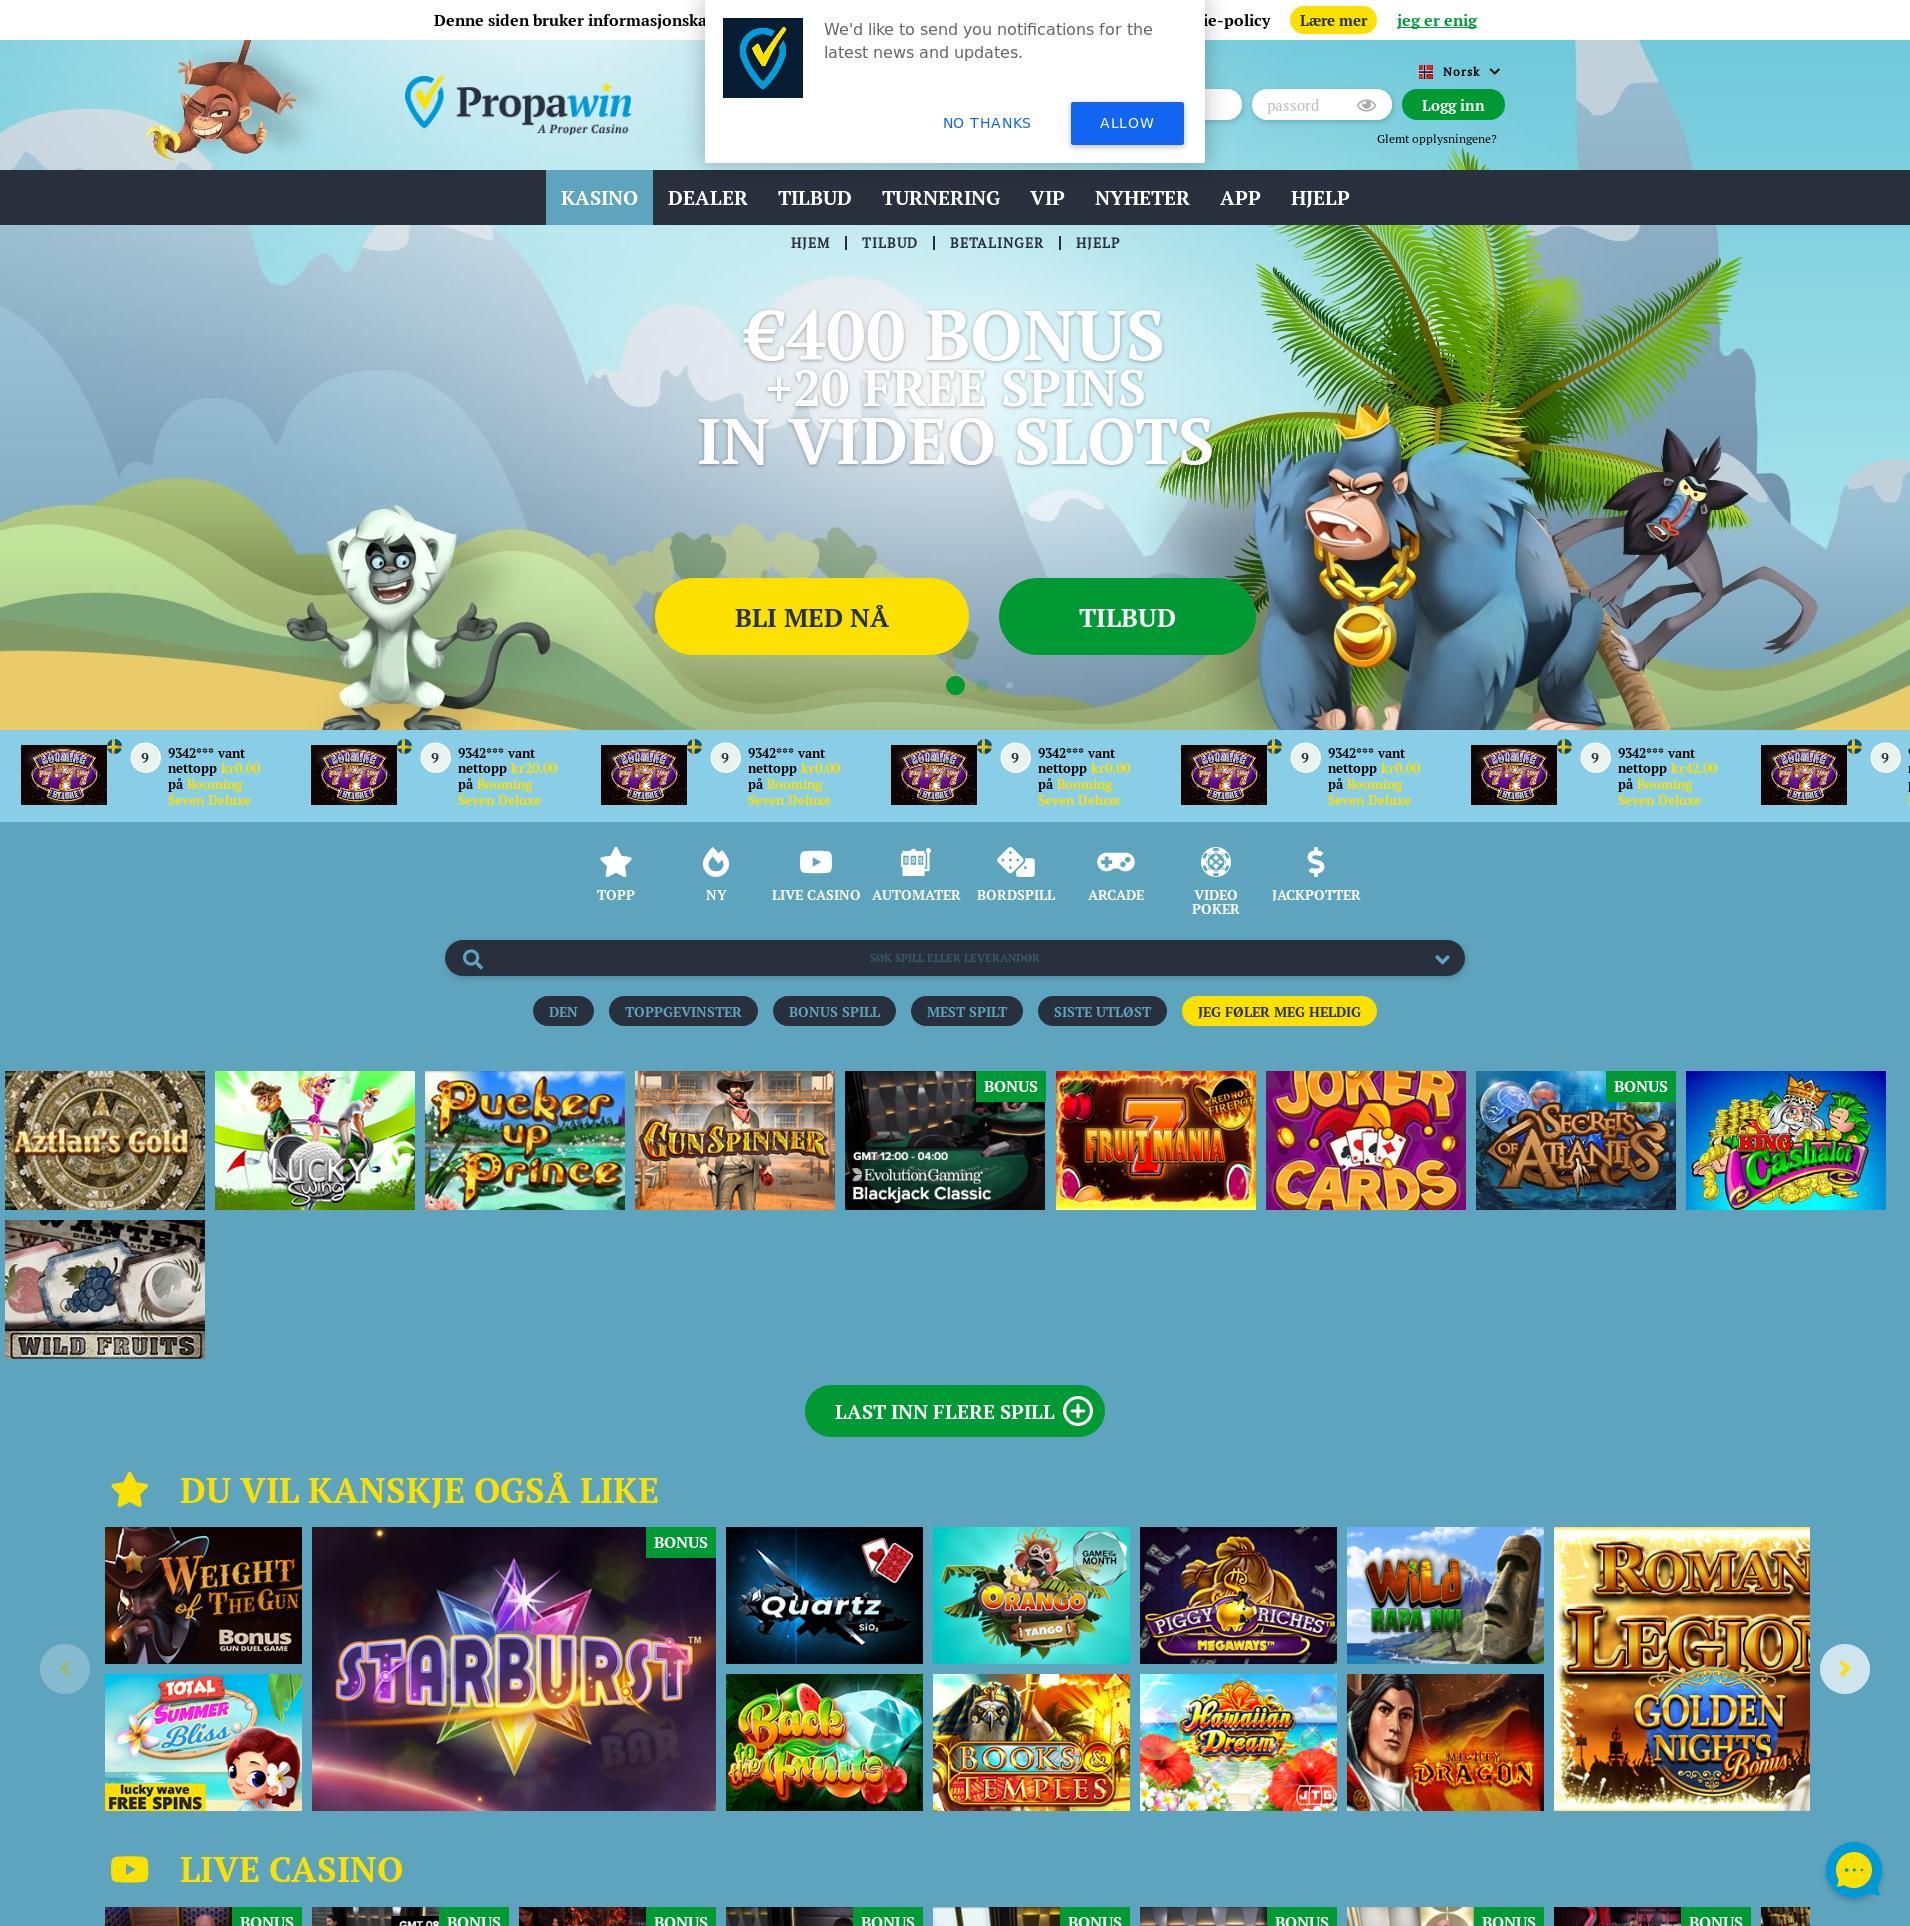 Casino skärm Lobby 2020-06-02 för Norge